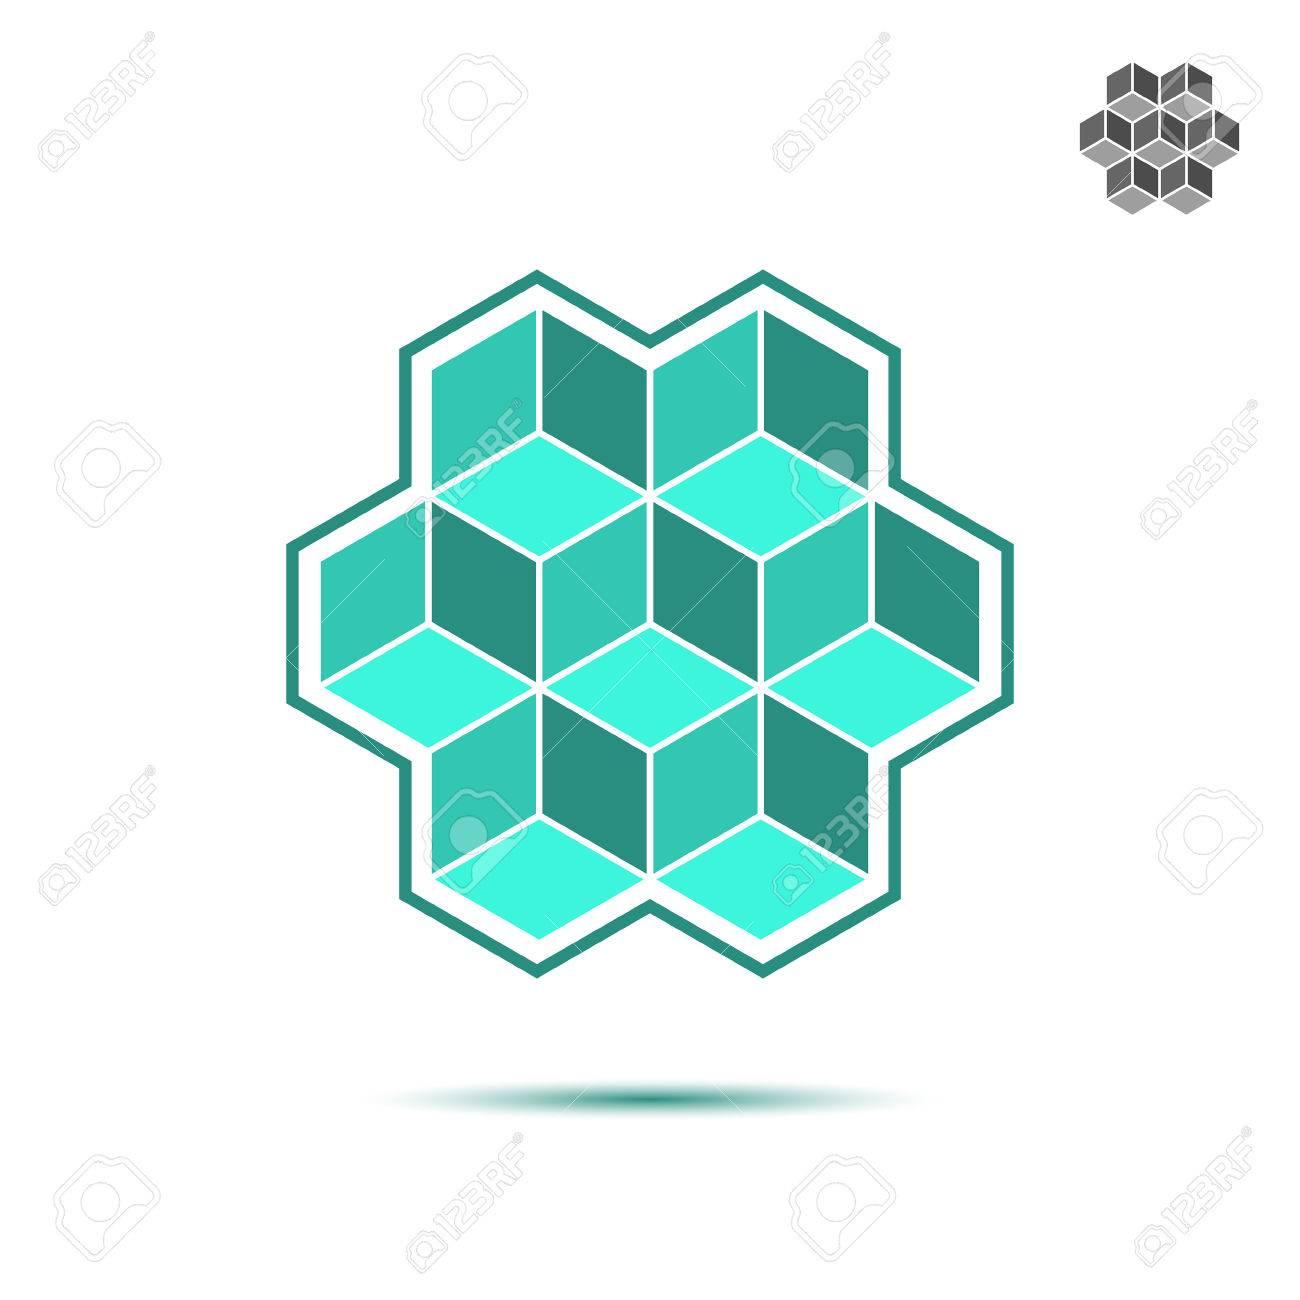 image logo maçonnerie